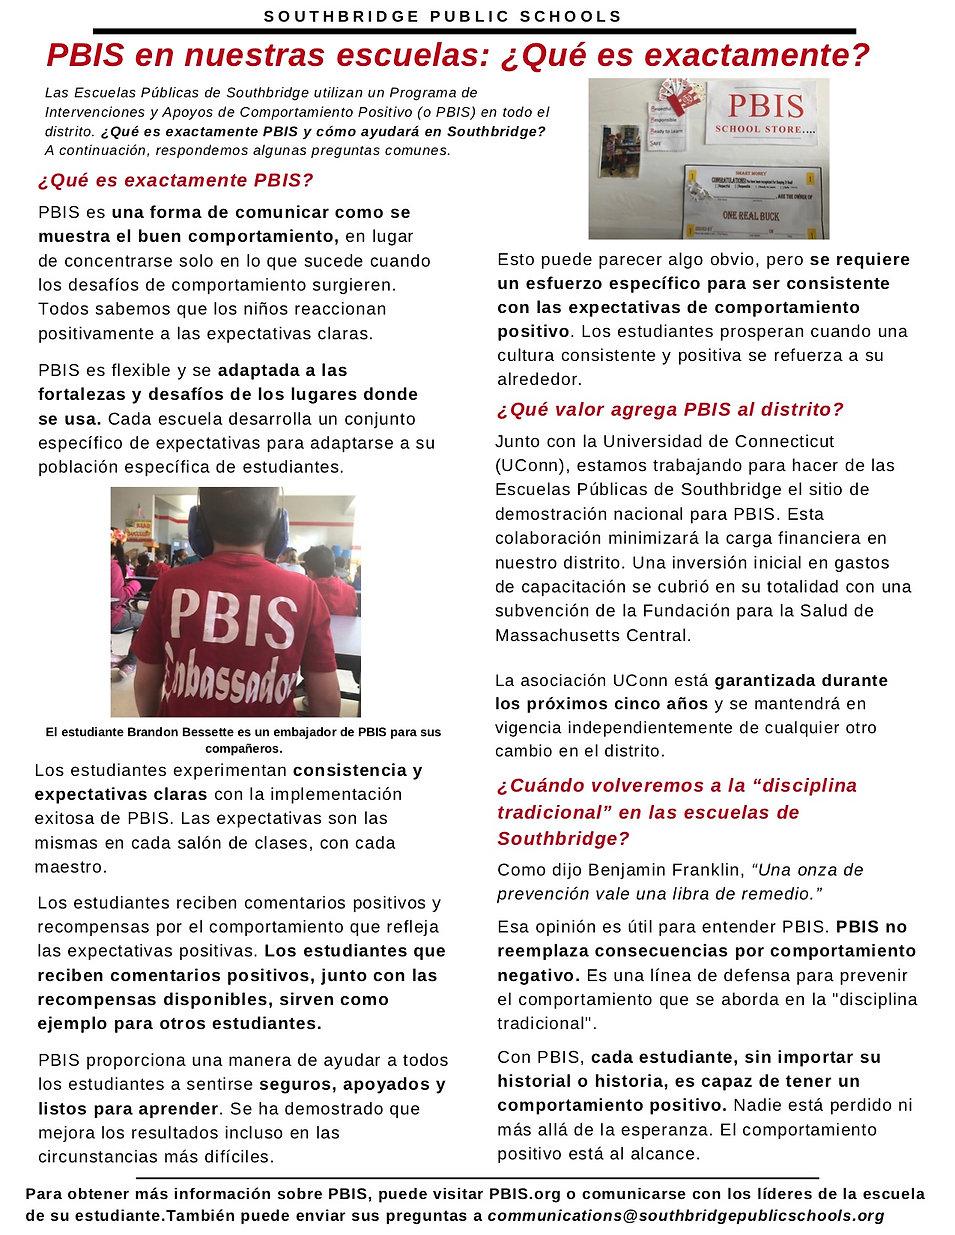 ESP PBIS what is it exactly  .jpg